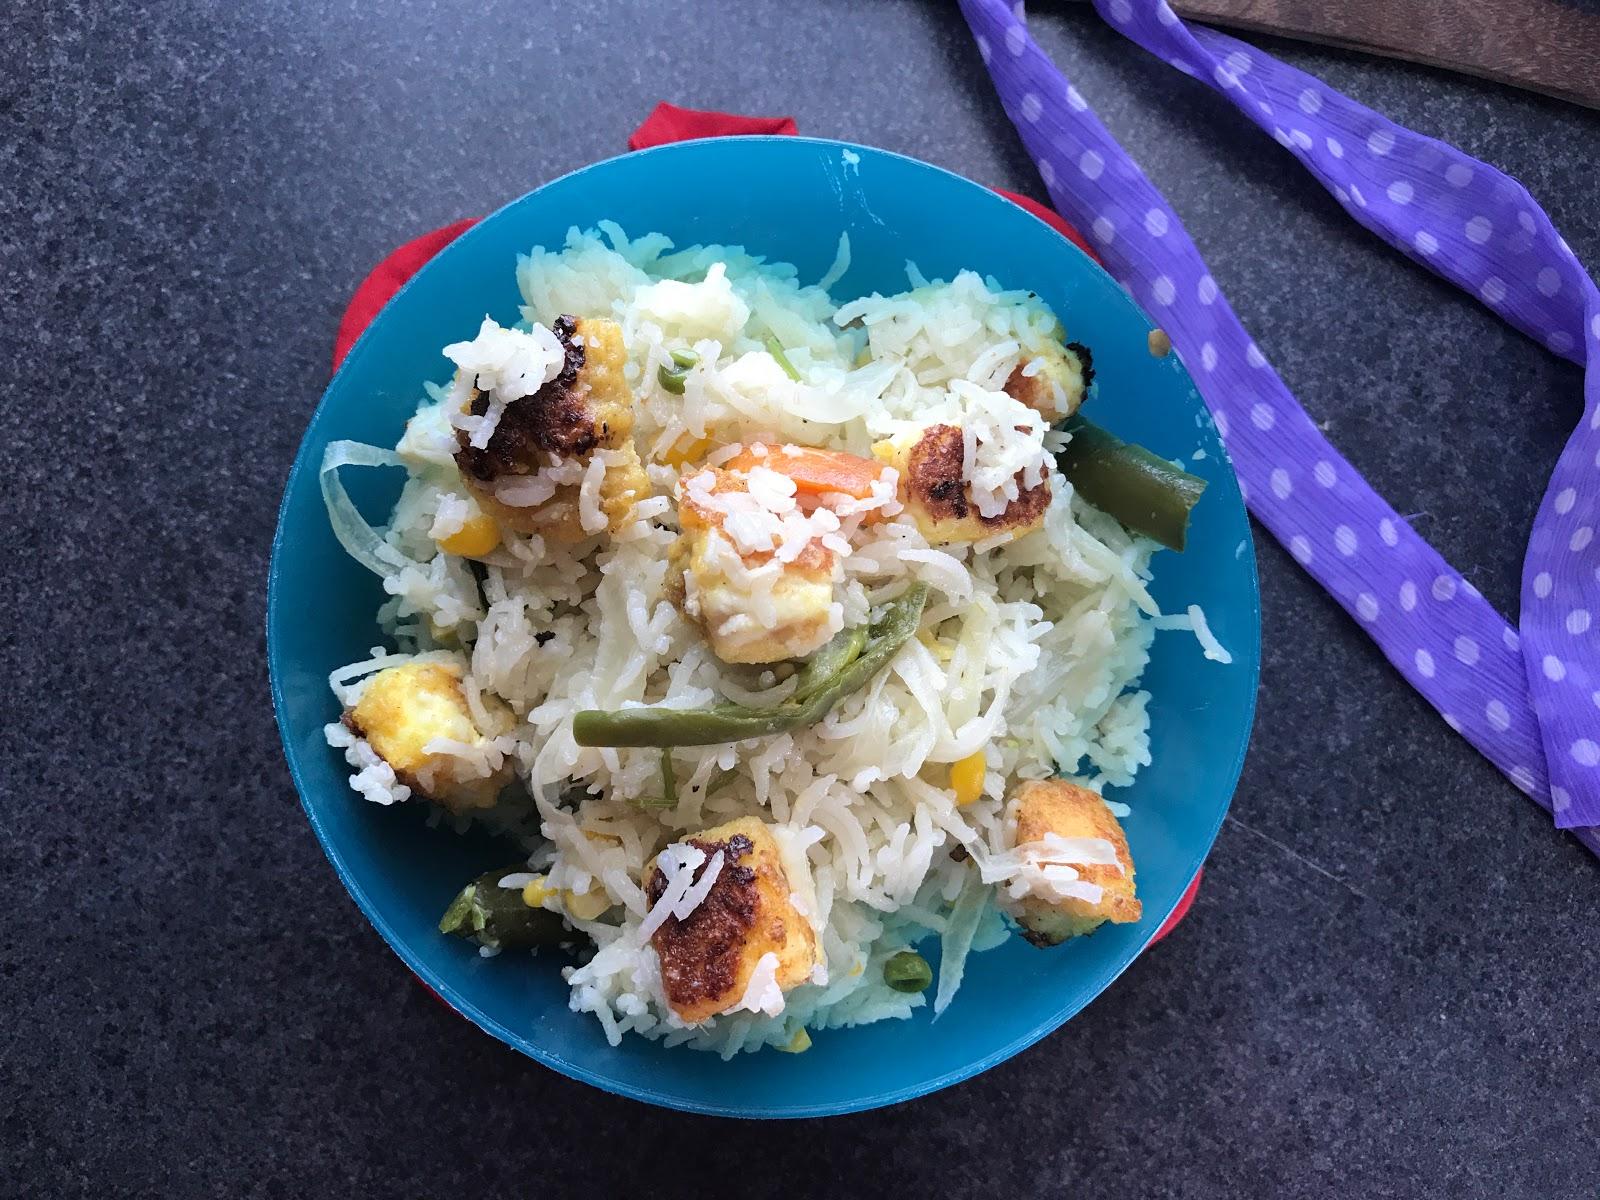 http://www.shobiskitchen.com/2017/08/paneercottage-cheese-pulao.html